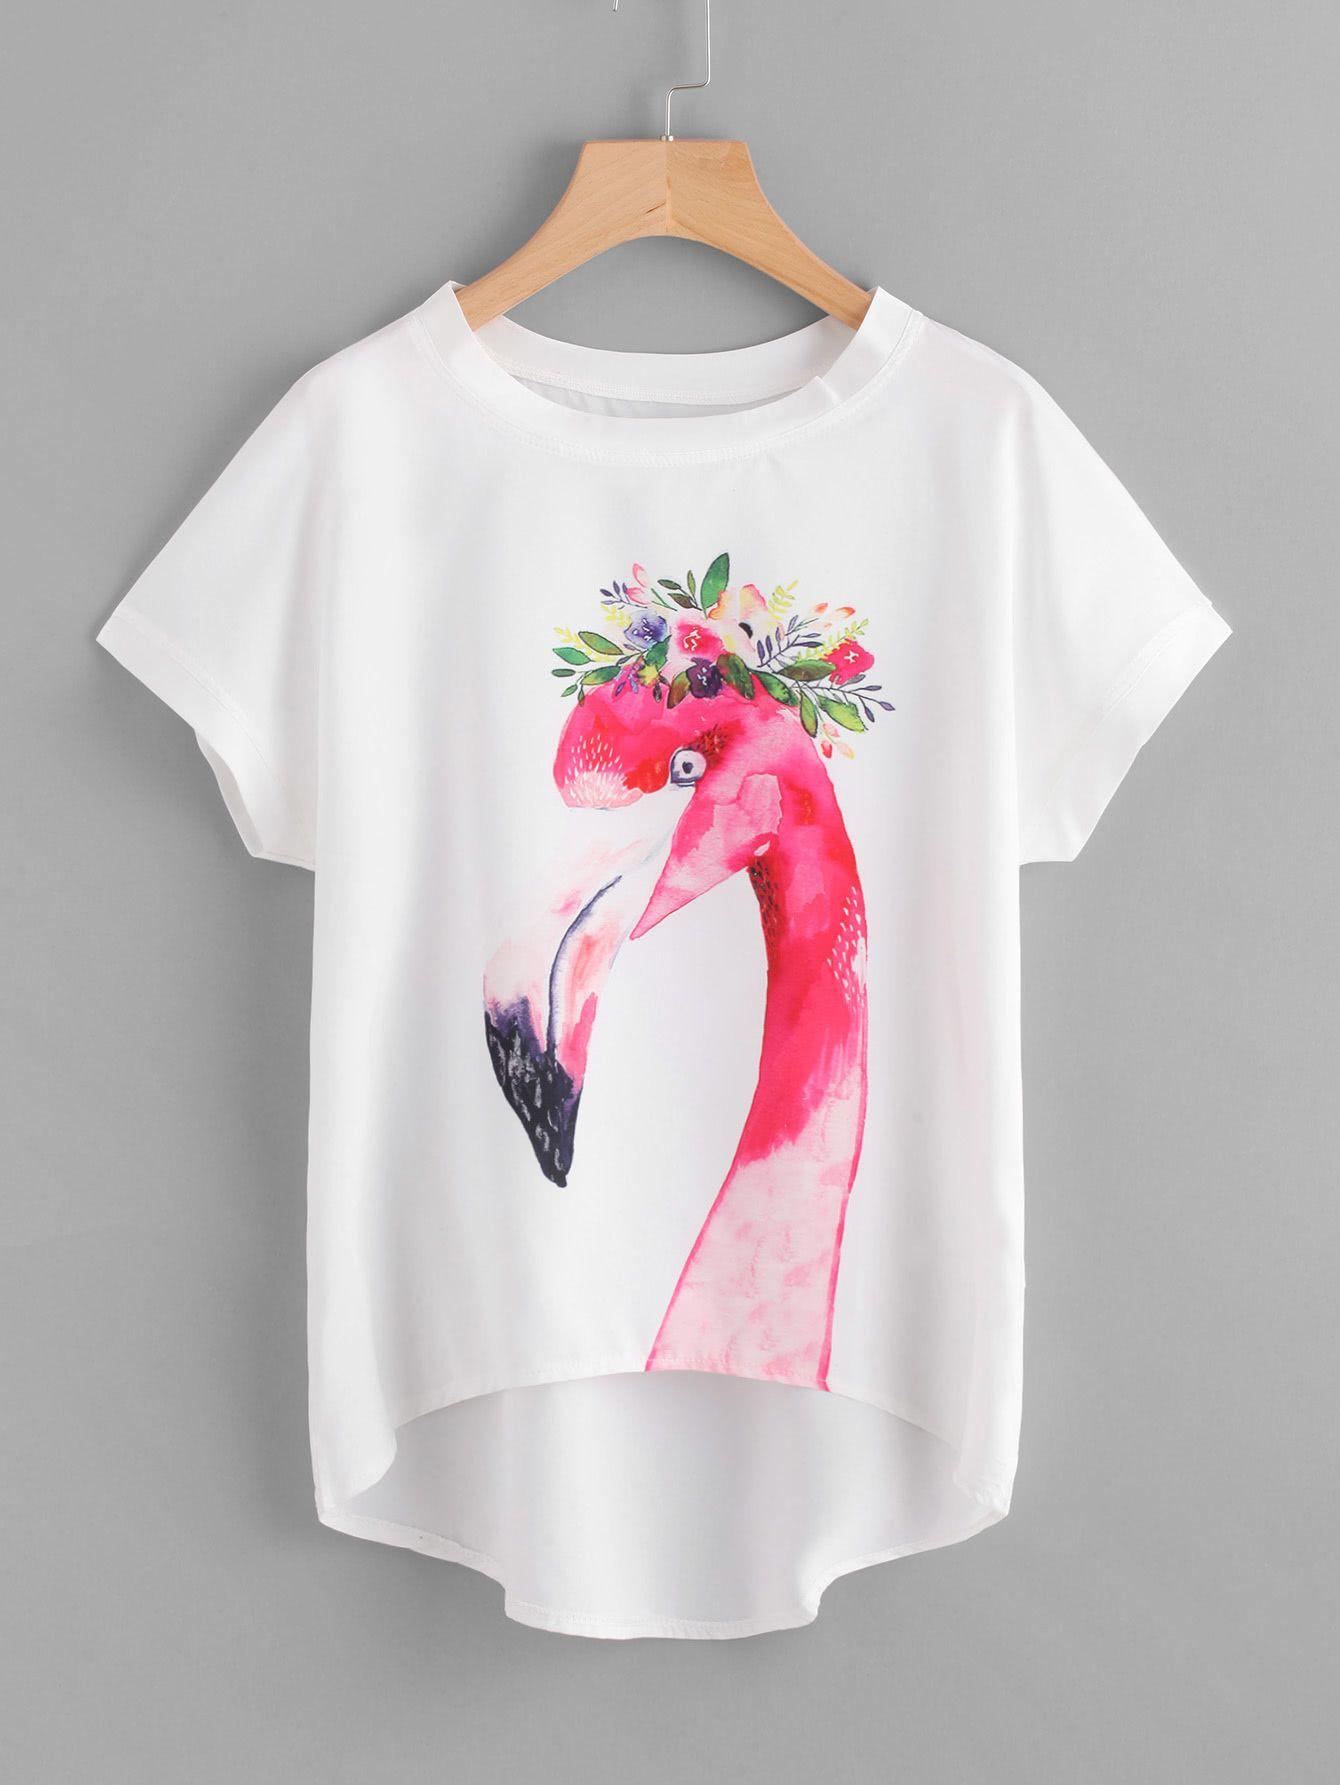 ef2f3d25c Shop Flamingo Print Batwing Sleeve Dip Hem Top online. SheIn offers  Flamingo Print Batwing Sleeve Dip Hem Top & more to fit your fashionable  needs.